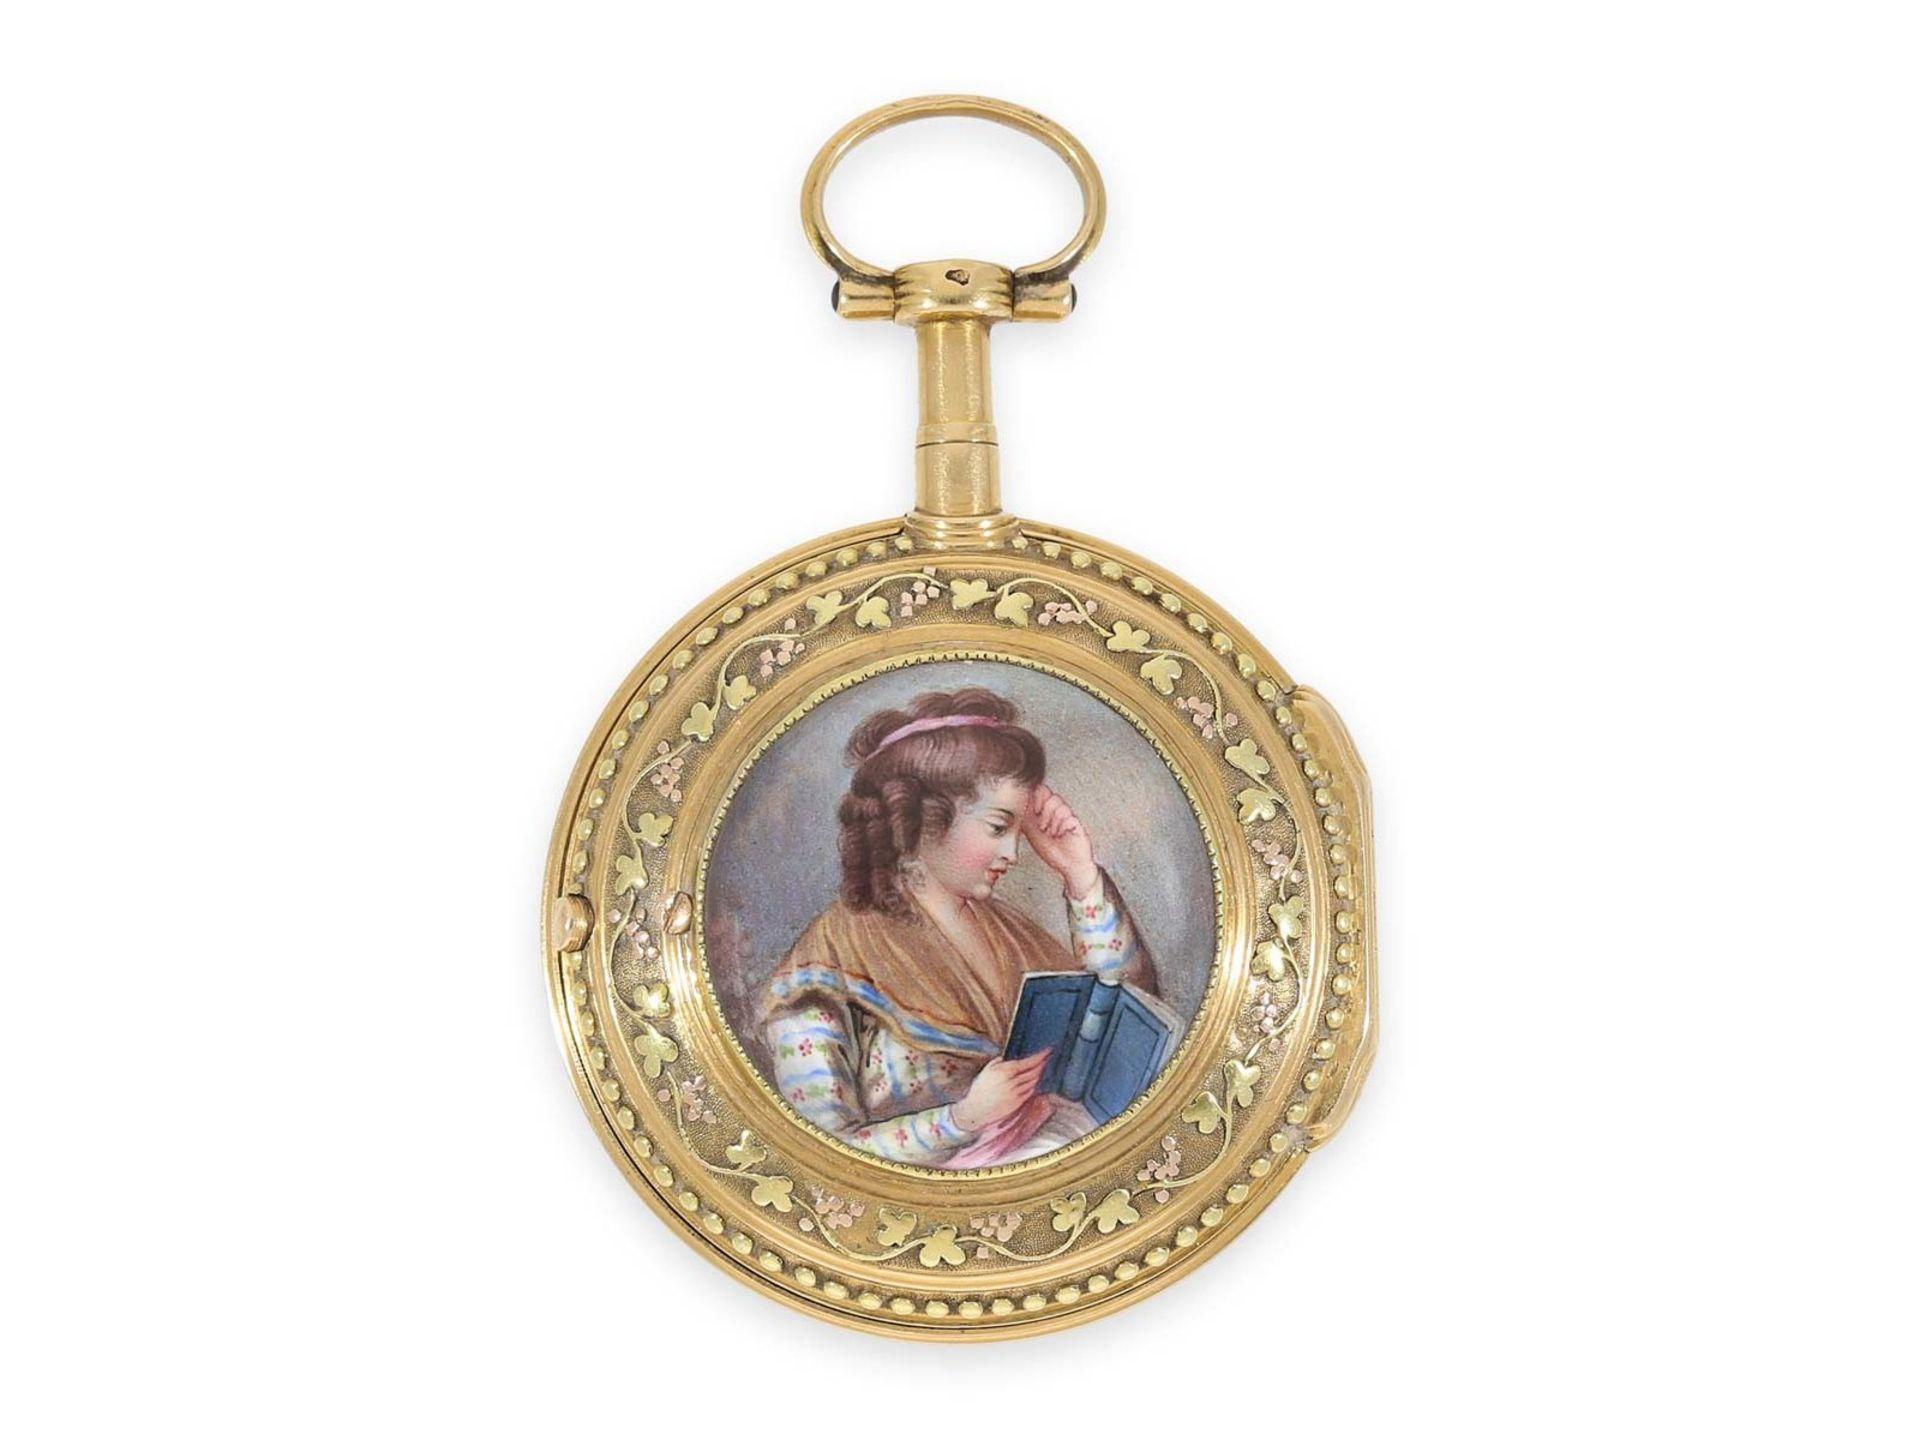 Pocket watch: gold/ enamel verge watch with finest enamel painting, excellent quality, Vaucher Paris